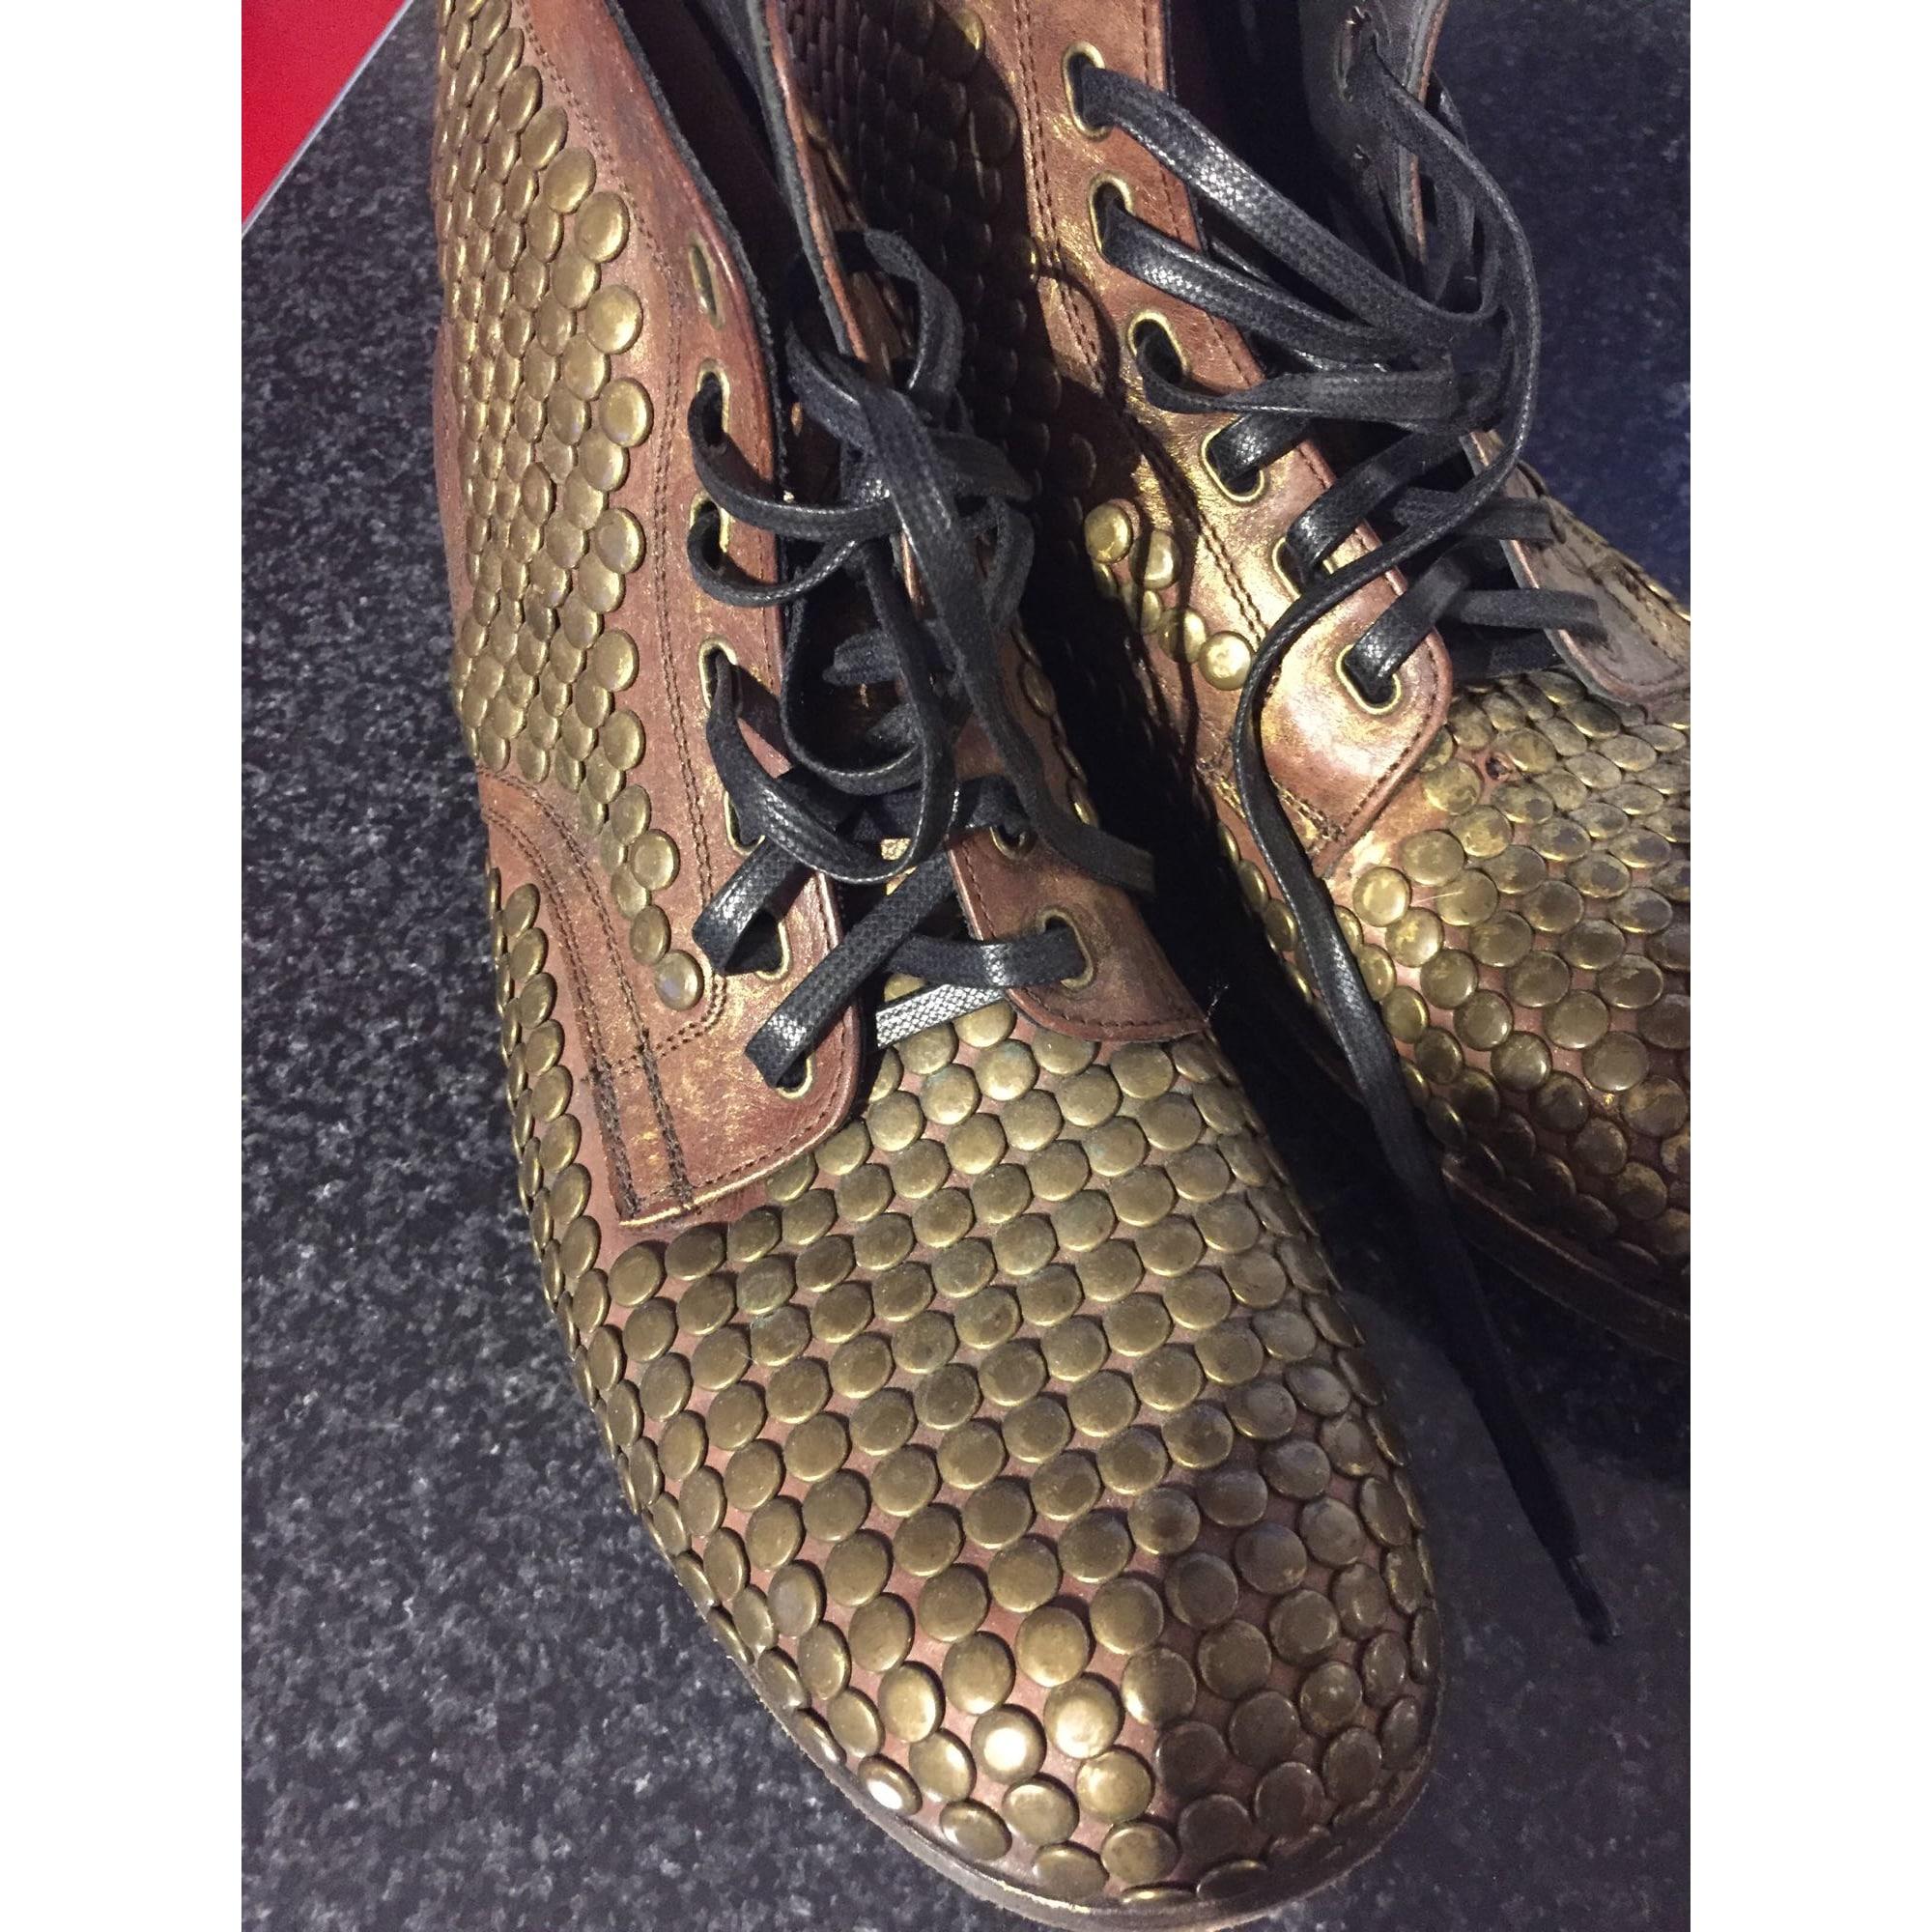 Lace Up Shoes DOLCE & GABBANA Golden, bronze, copper